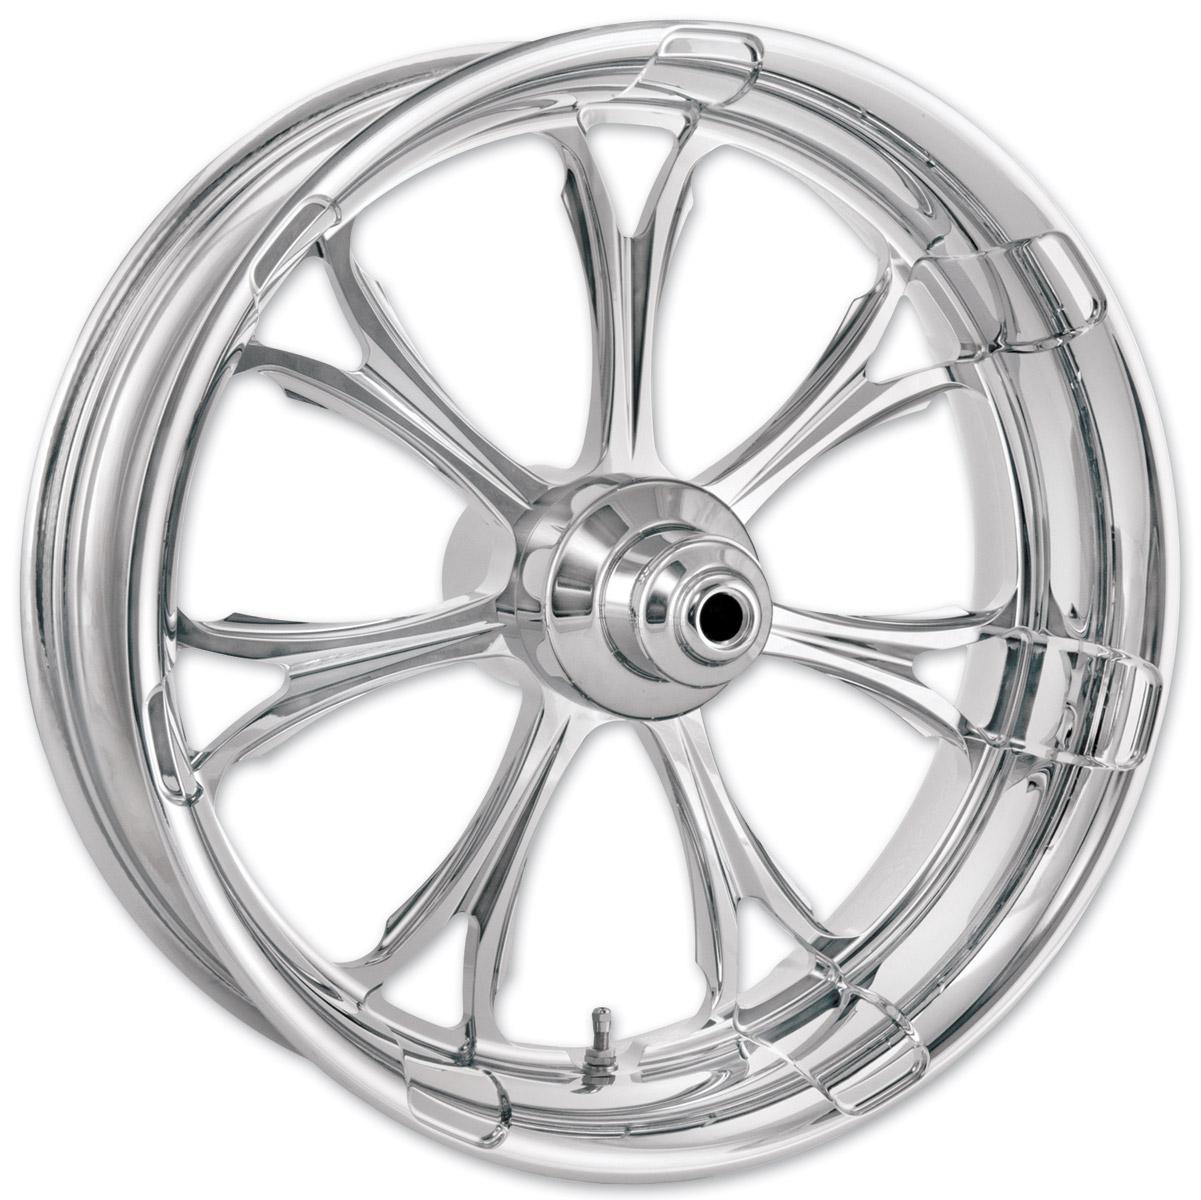 Performance Machine Paramount Chrome Front Wheel, 18″ X 3.5″